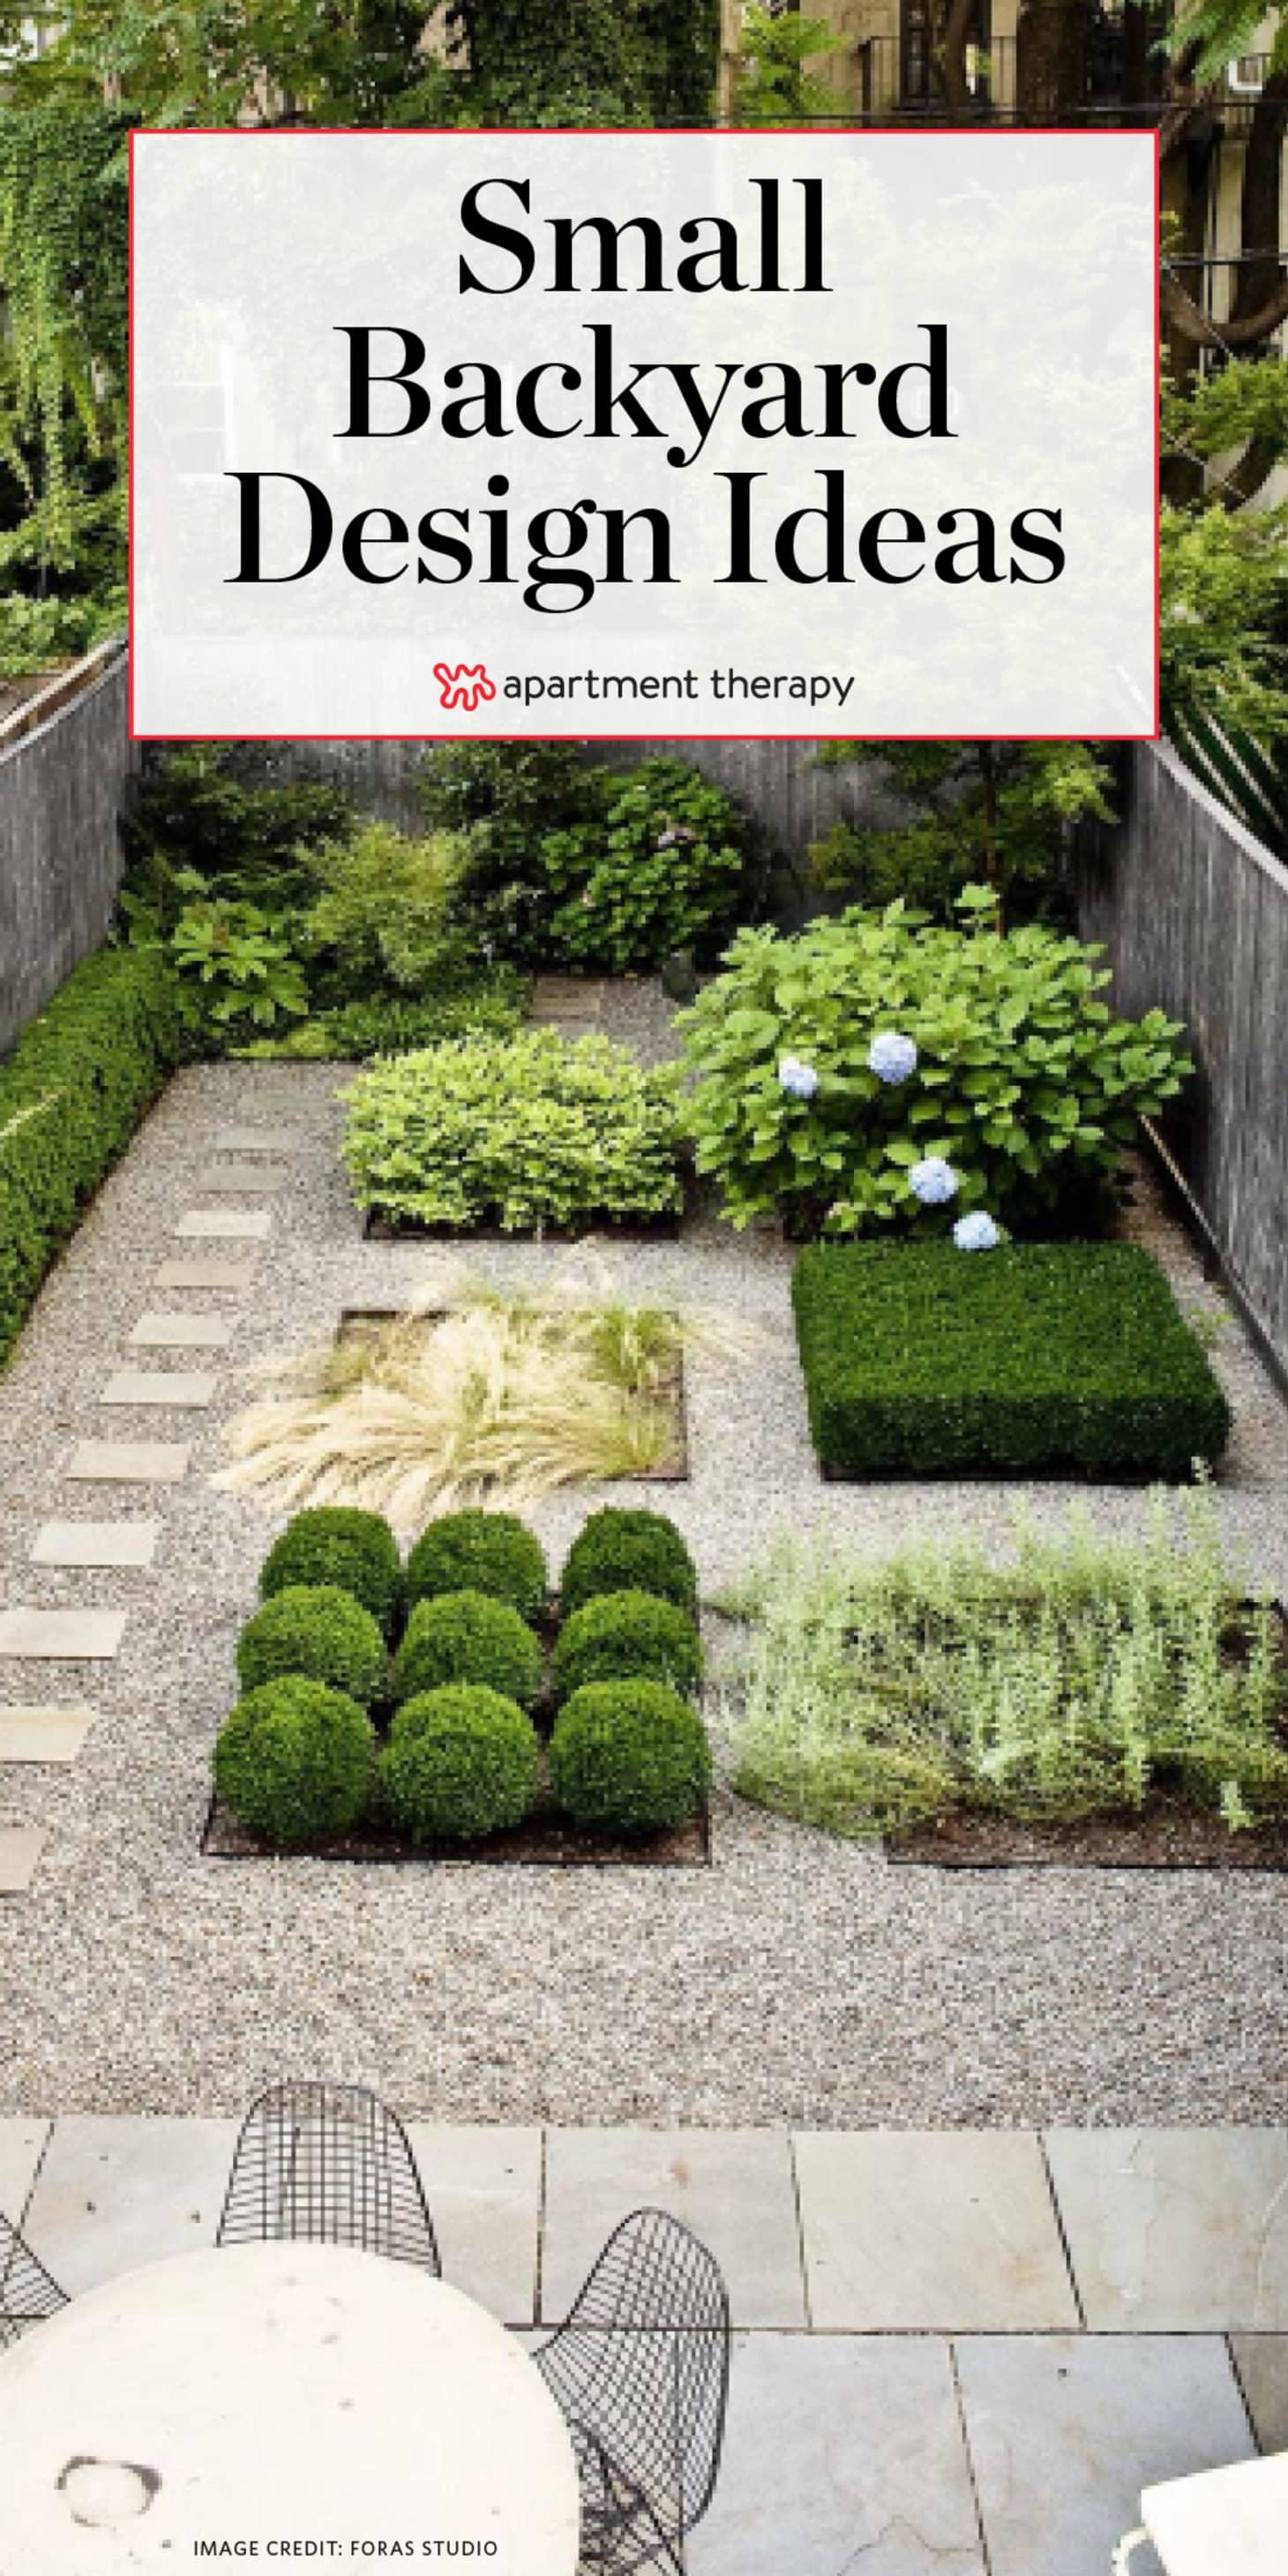 Small Backyard Design Ideas & Inspiration | Apartment Therapy on Apartment Backyard Patio Ideas id=22006